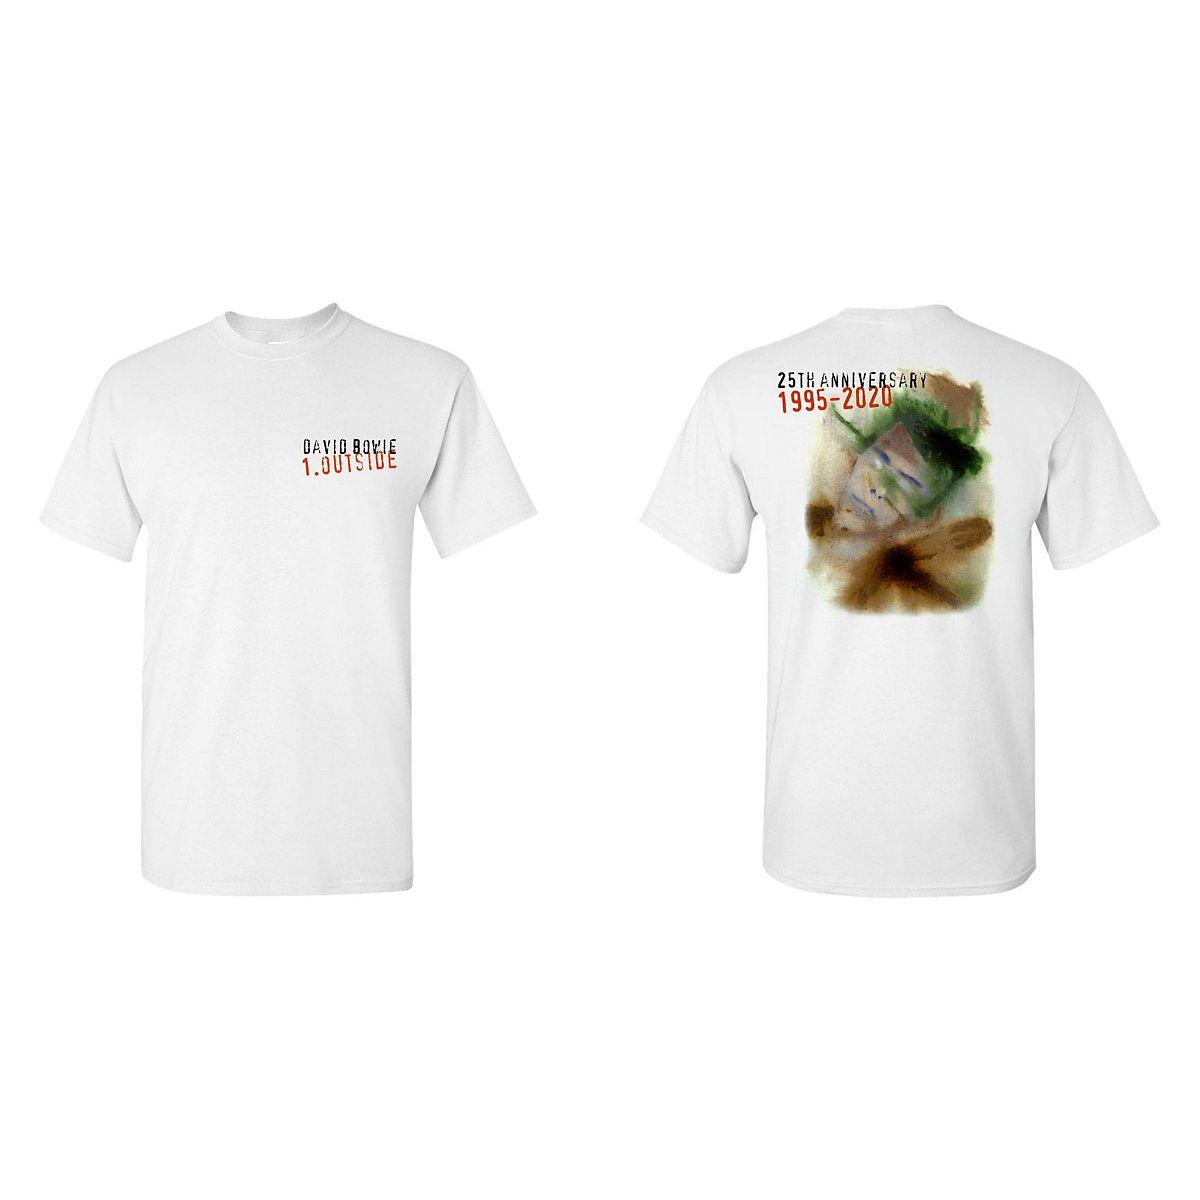 David Bowie Outside 25th Anniversary White T-shirt